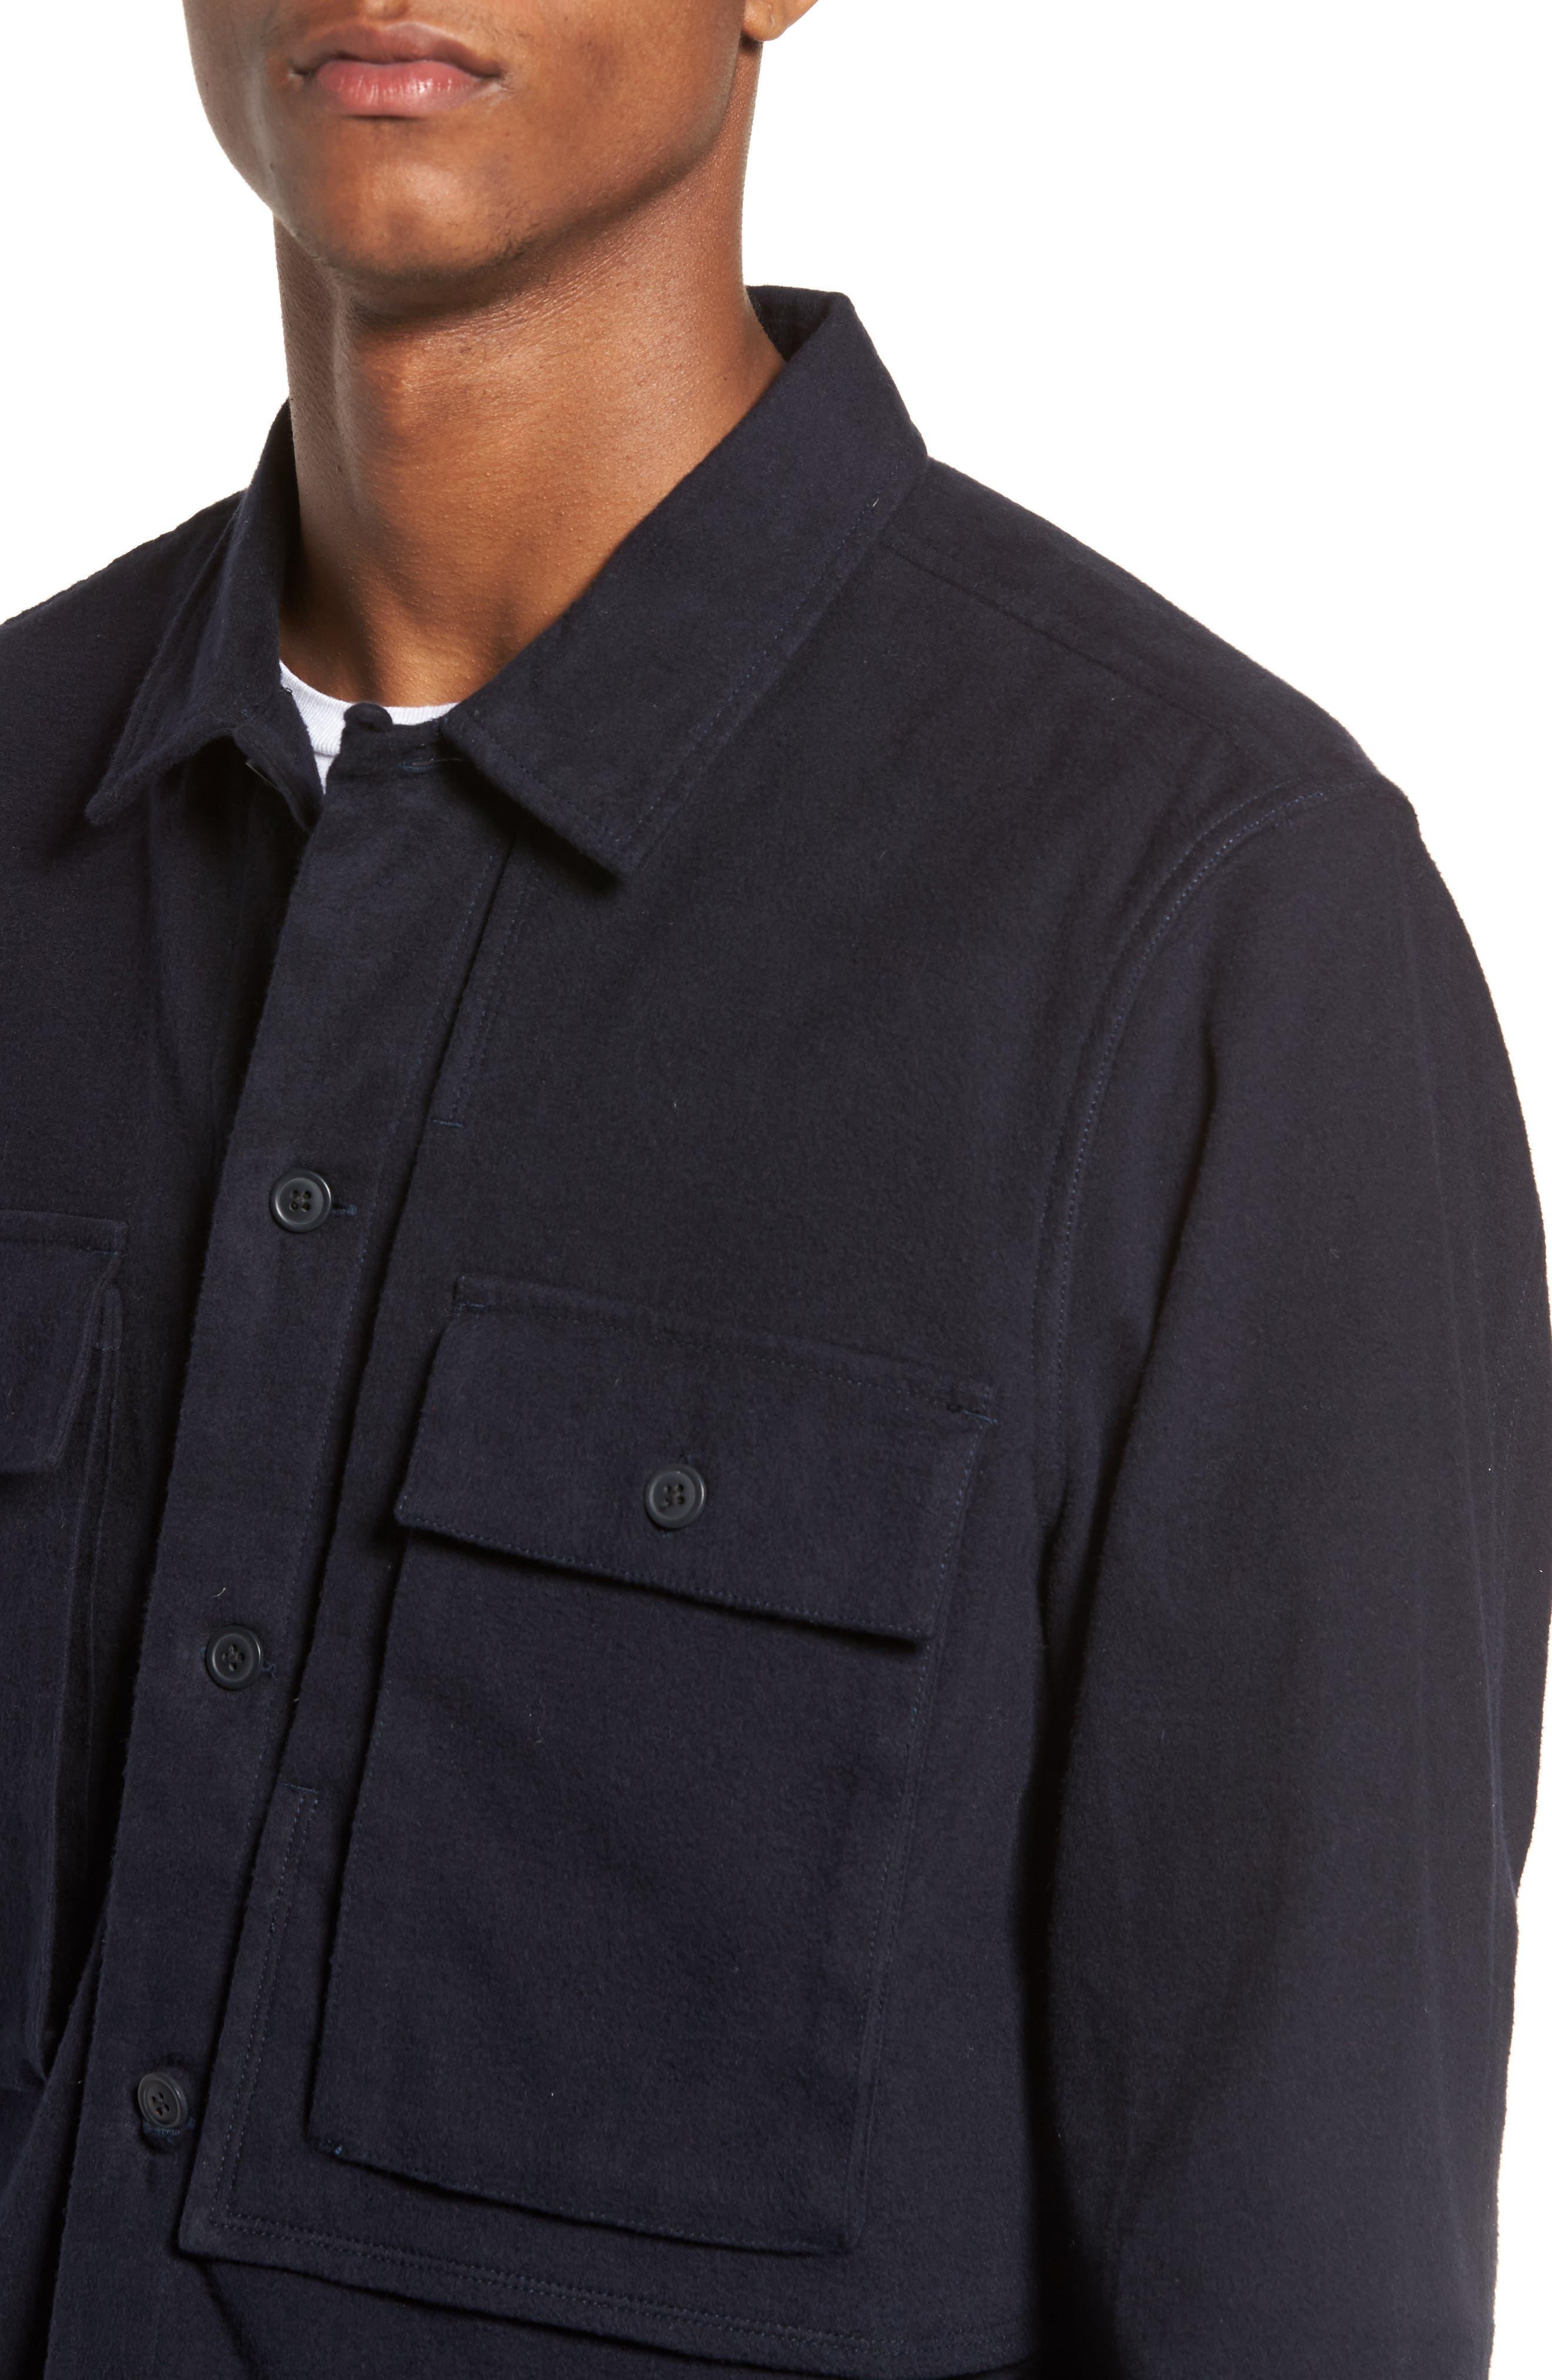 Flannel Shirt Jacket,                             Alternate thumbnail 5, color,                             Navy Iris